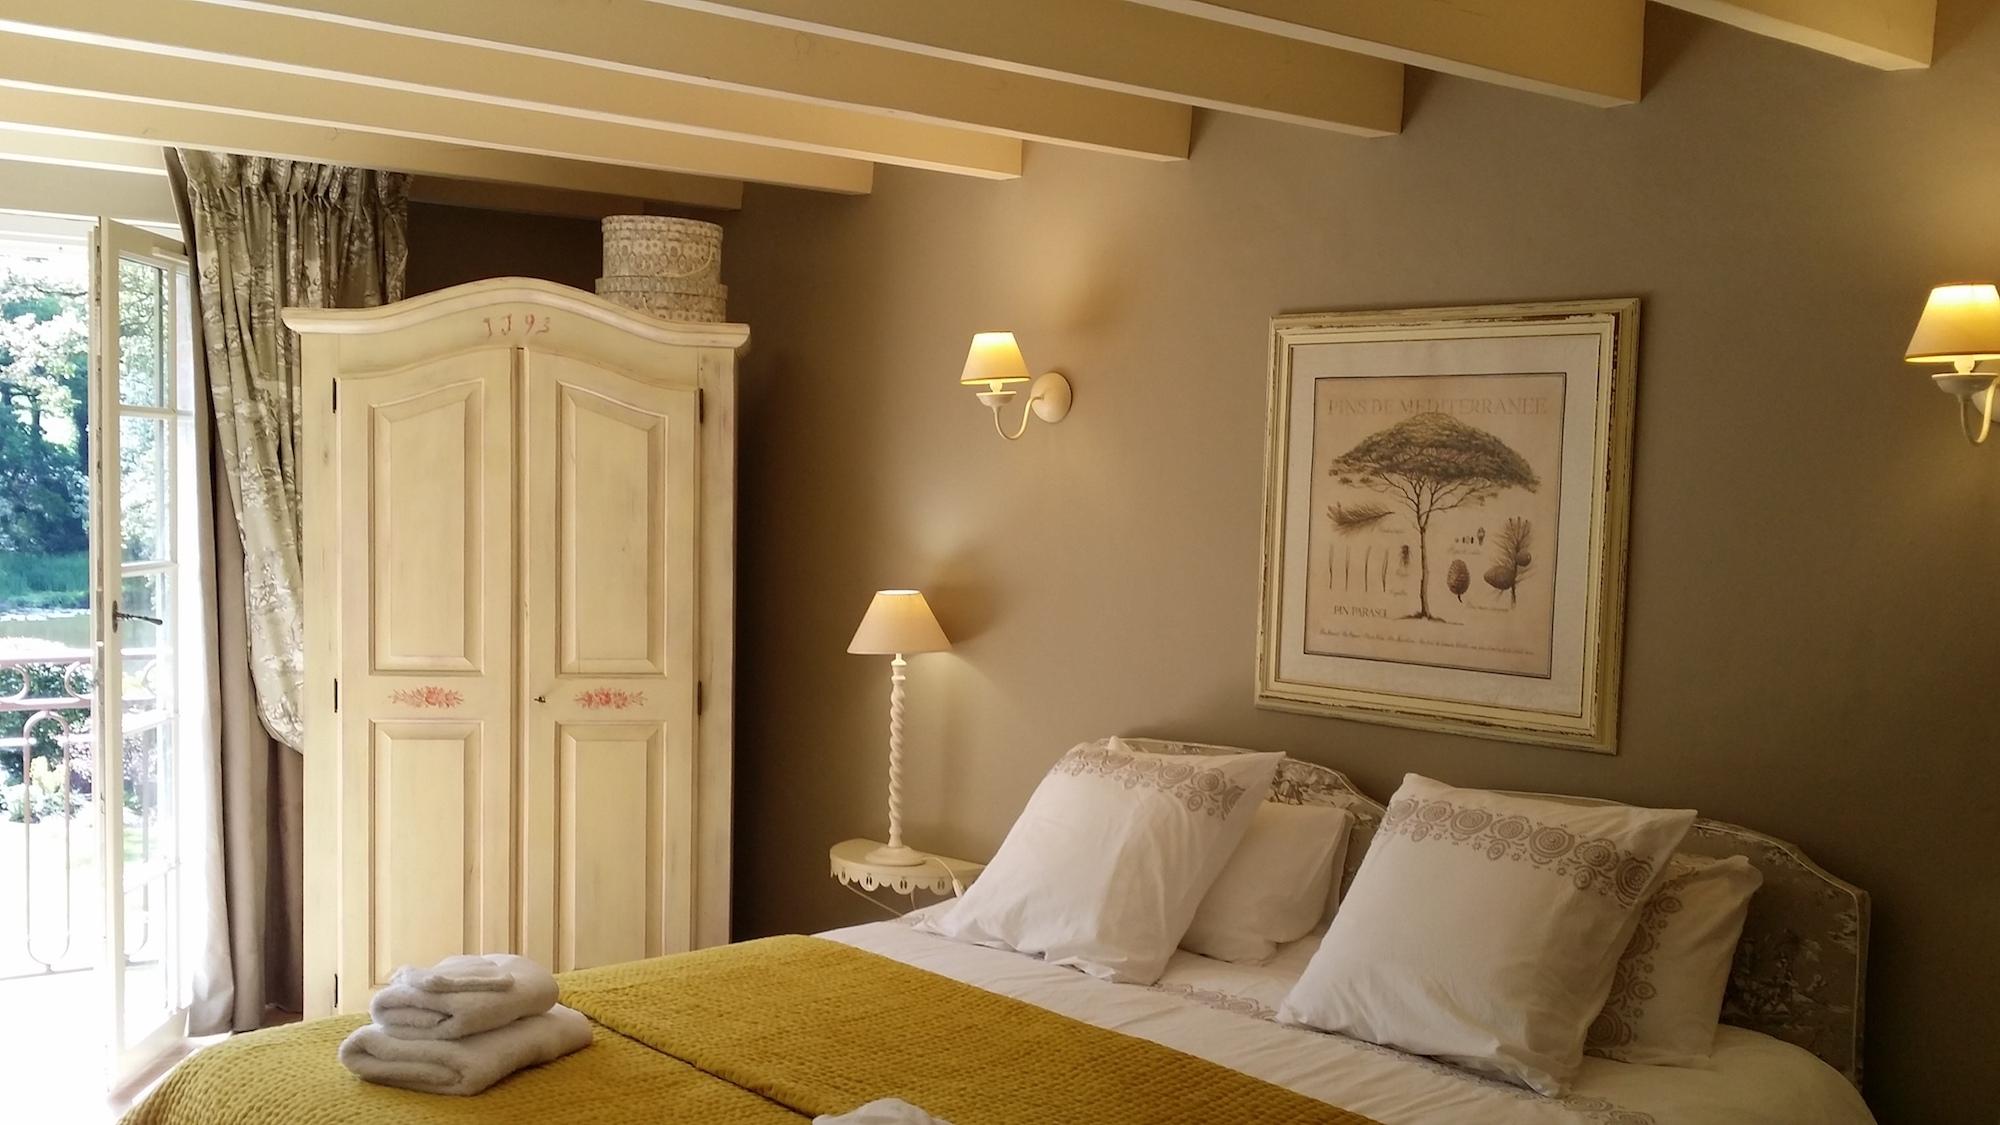 les chambres logis du grand moulin. Black Bedroom Furniture Sets. Home Design Ideas